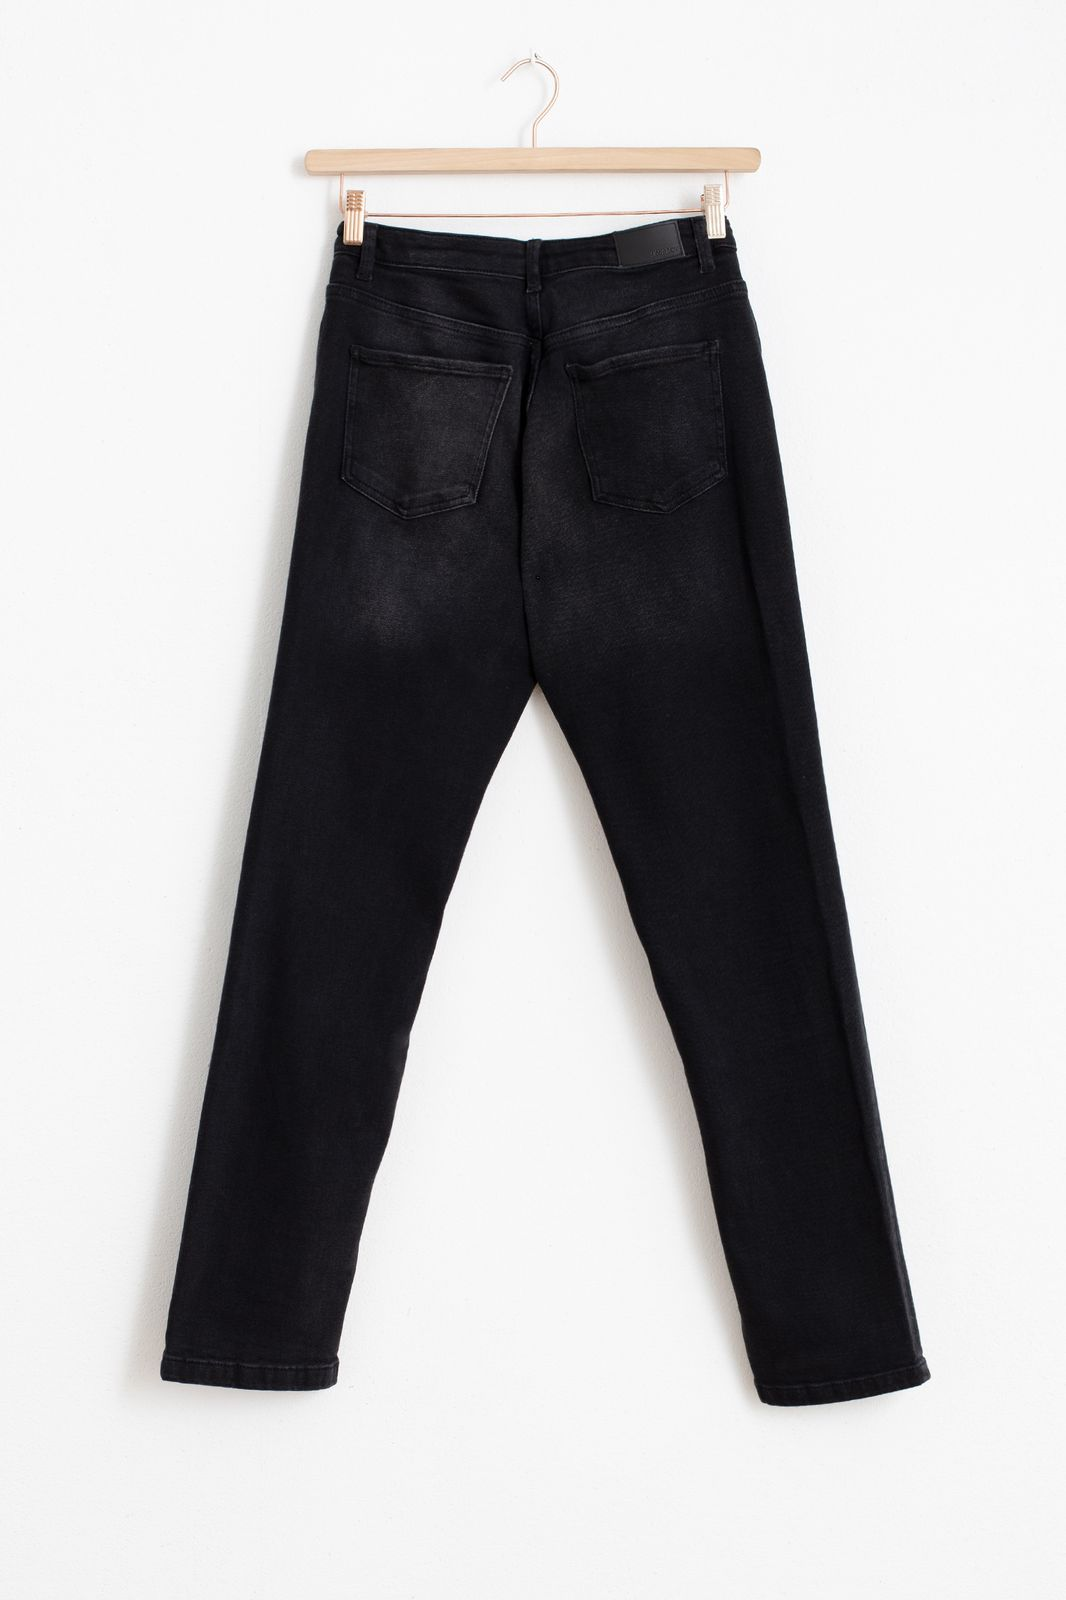 Zwarte tapered fit jeans - Dames | Sissy-Boy